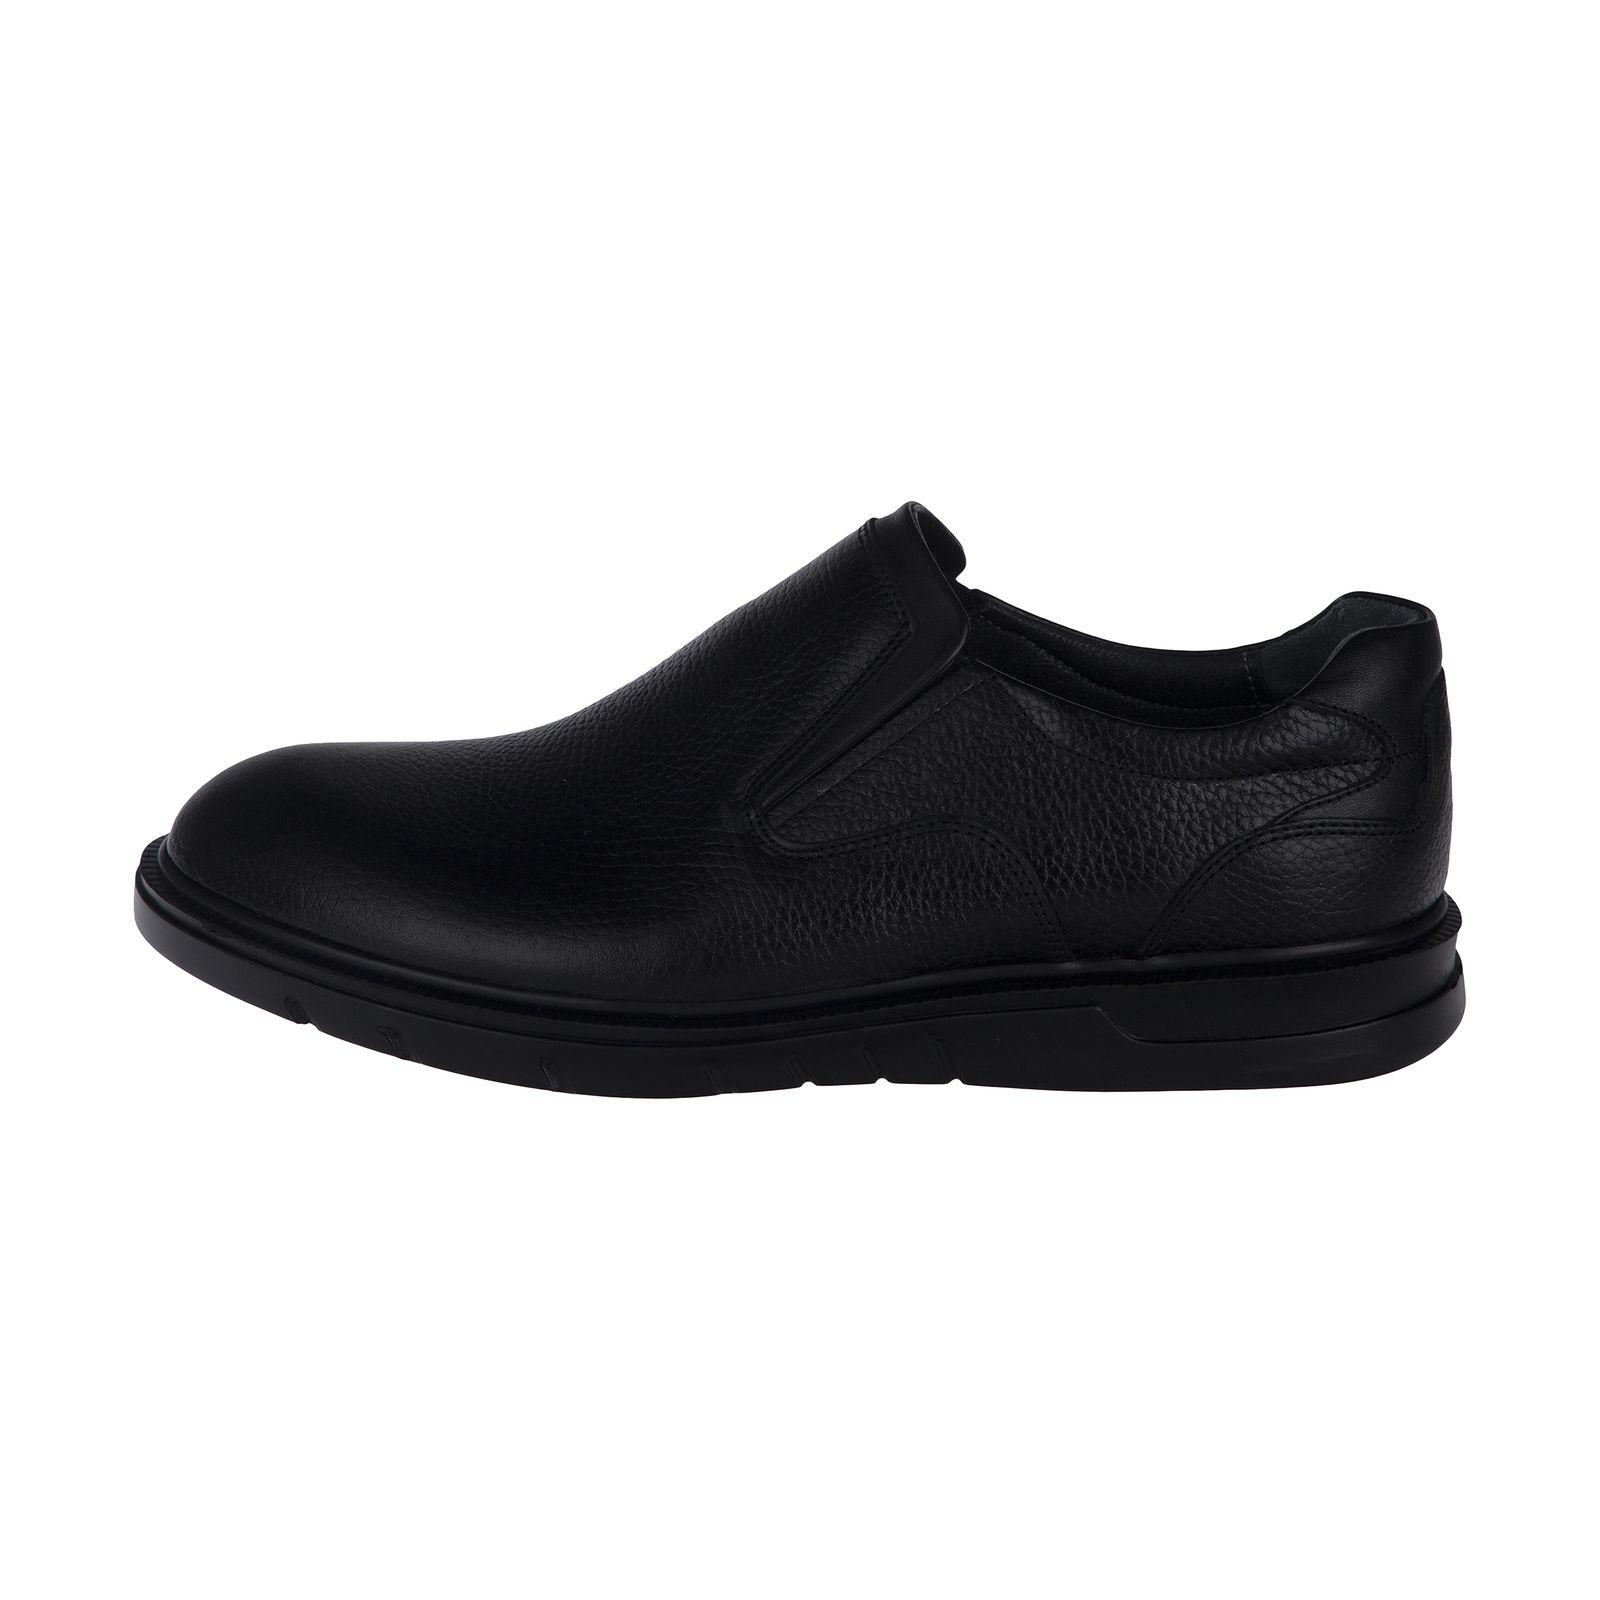 کفش روزمره مردانه بلوط مدل 7240C503101 -  - 2